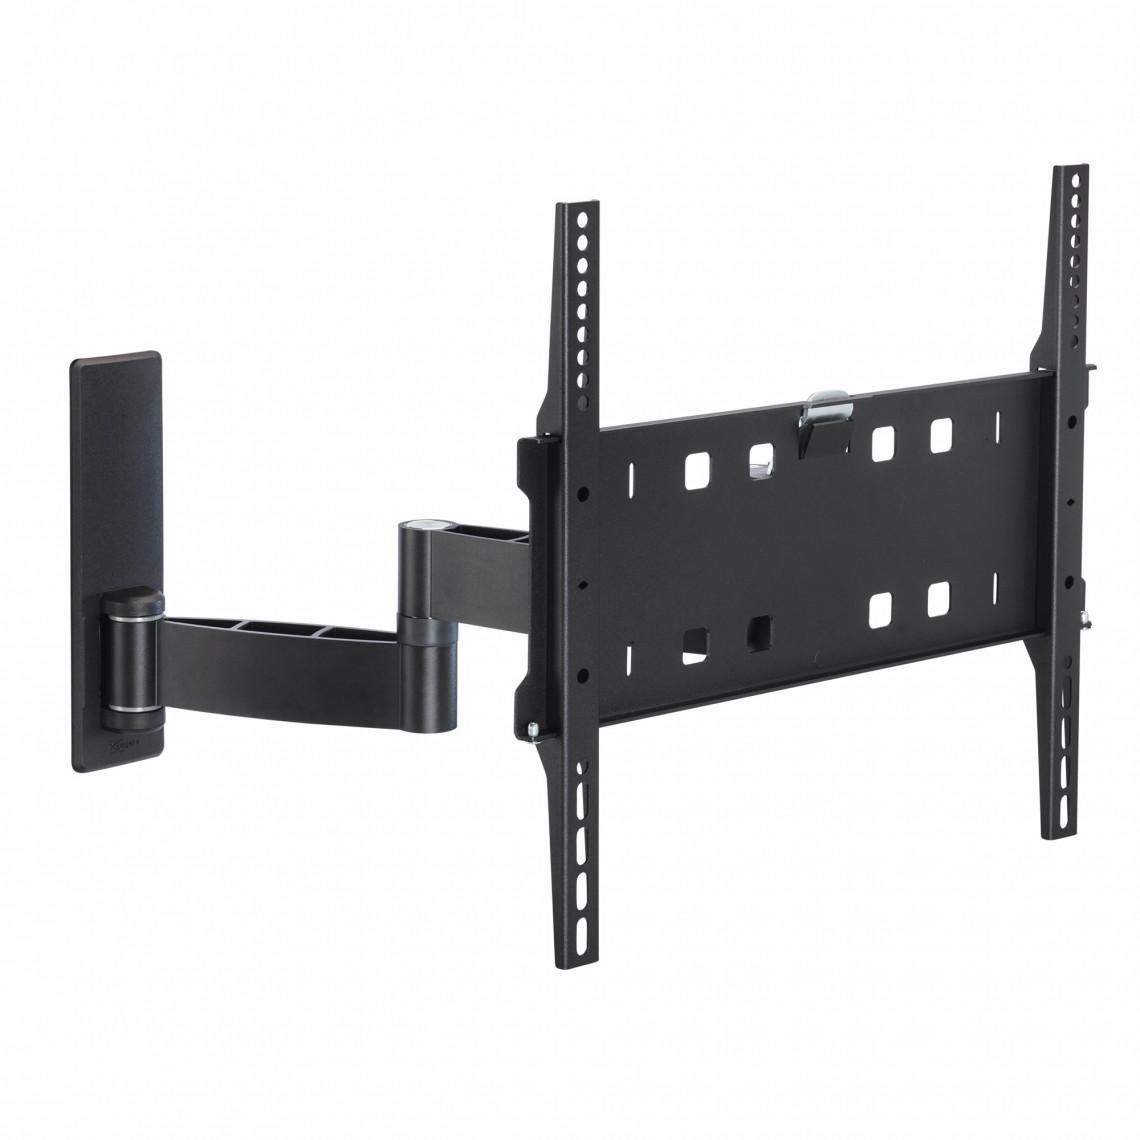 Vogel's Pro PFW 3040 Display Wall Mount Turn and Tilt